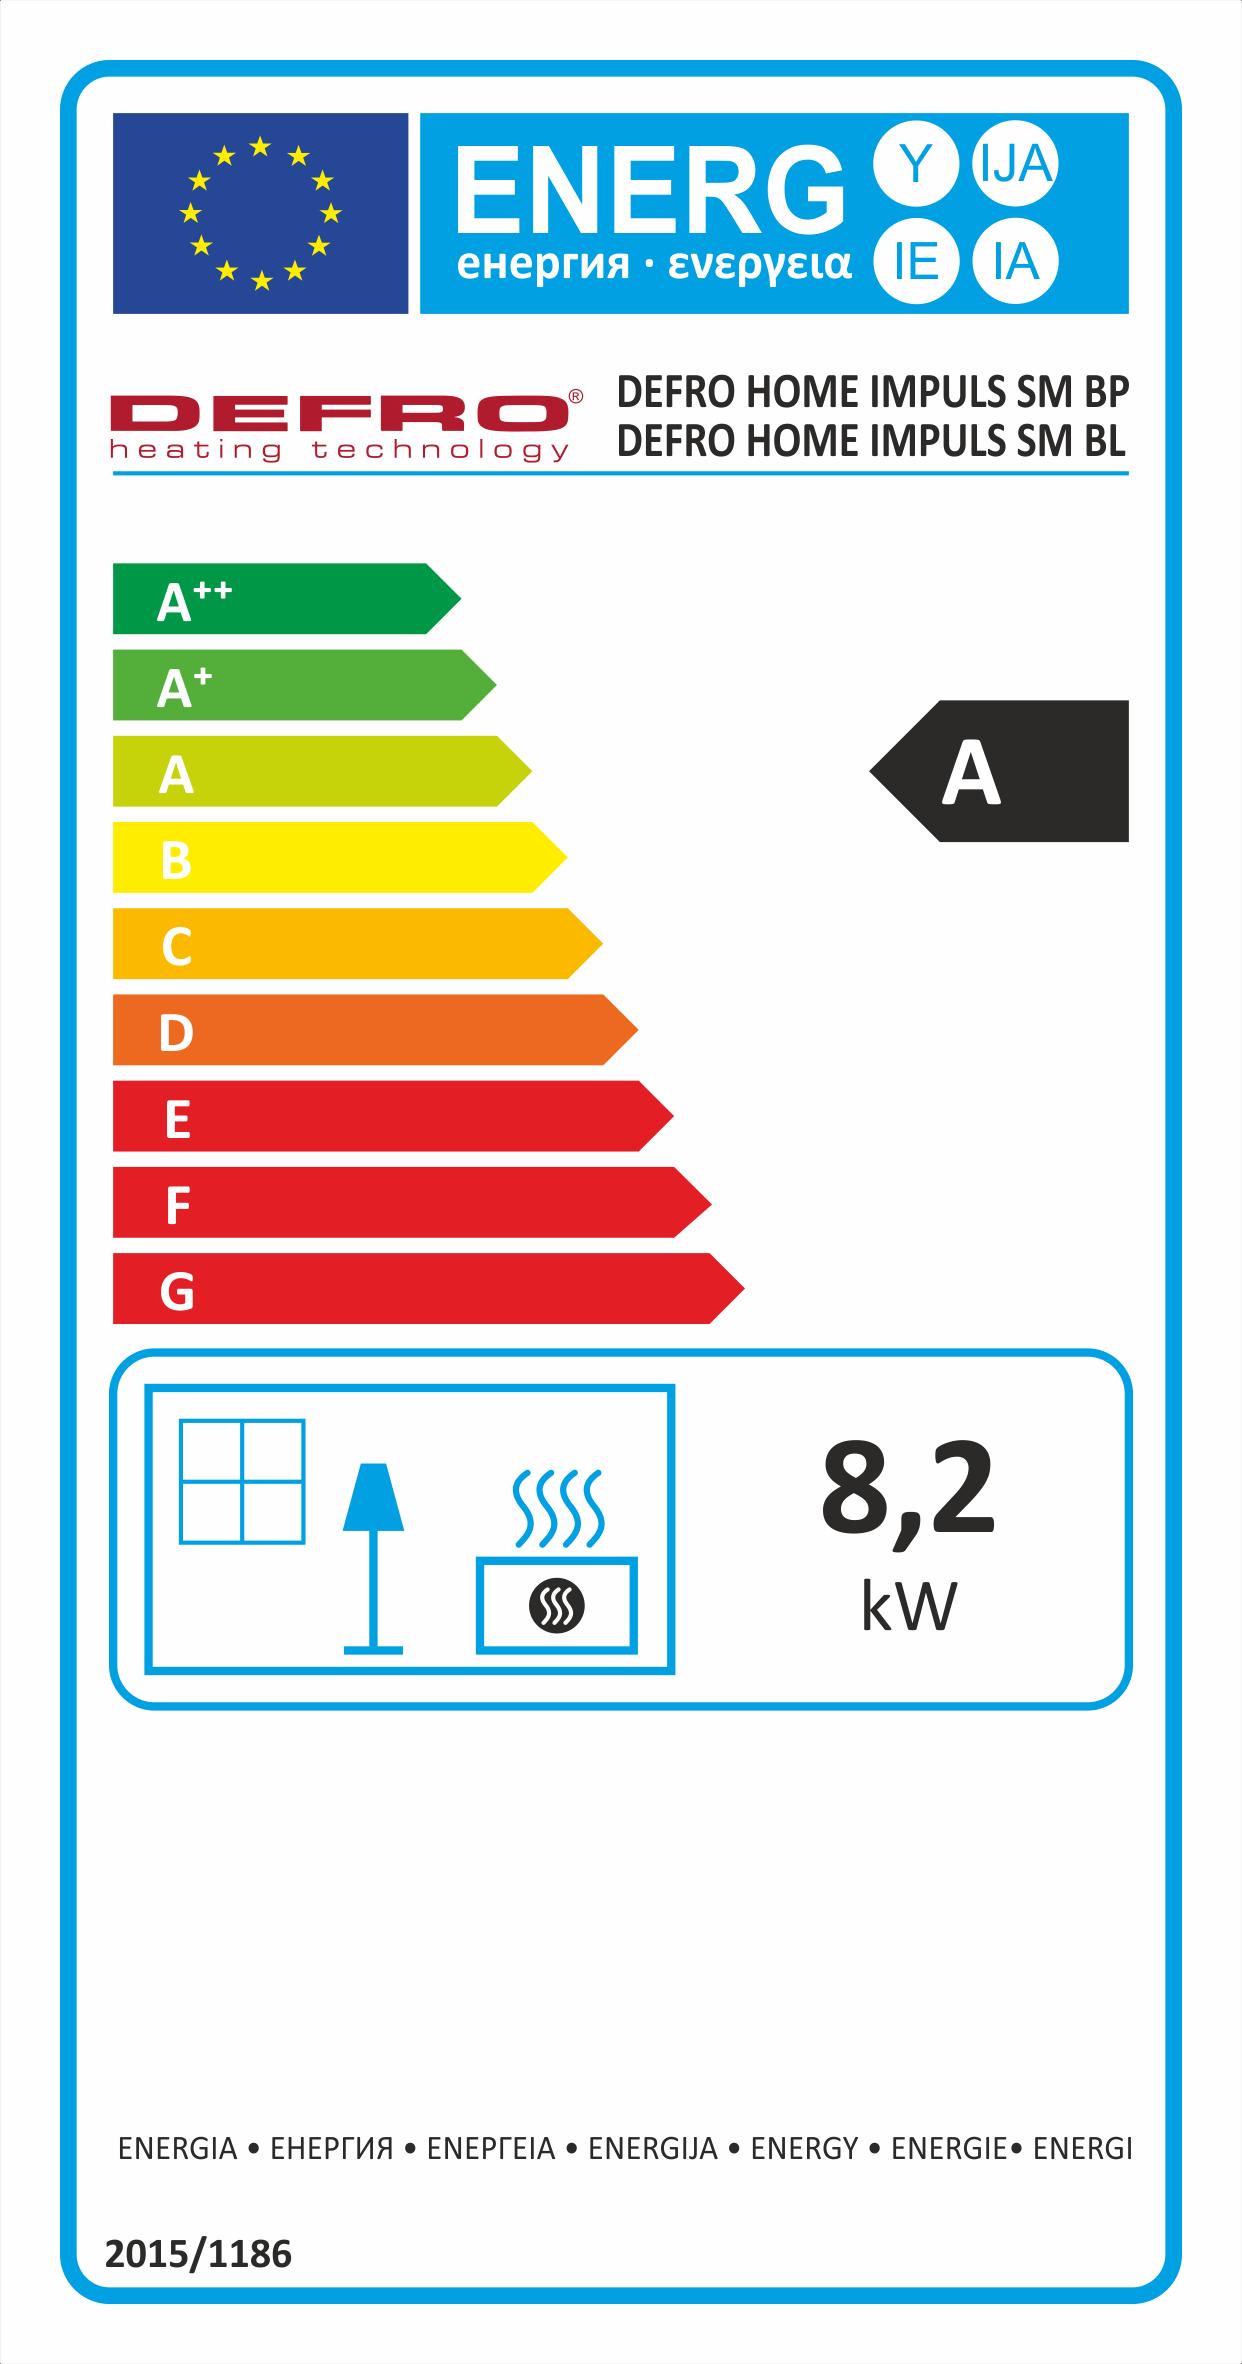 Defro Home Impuls SM BL energeticky stitok krbyonline